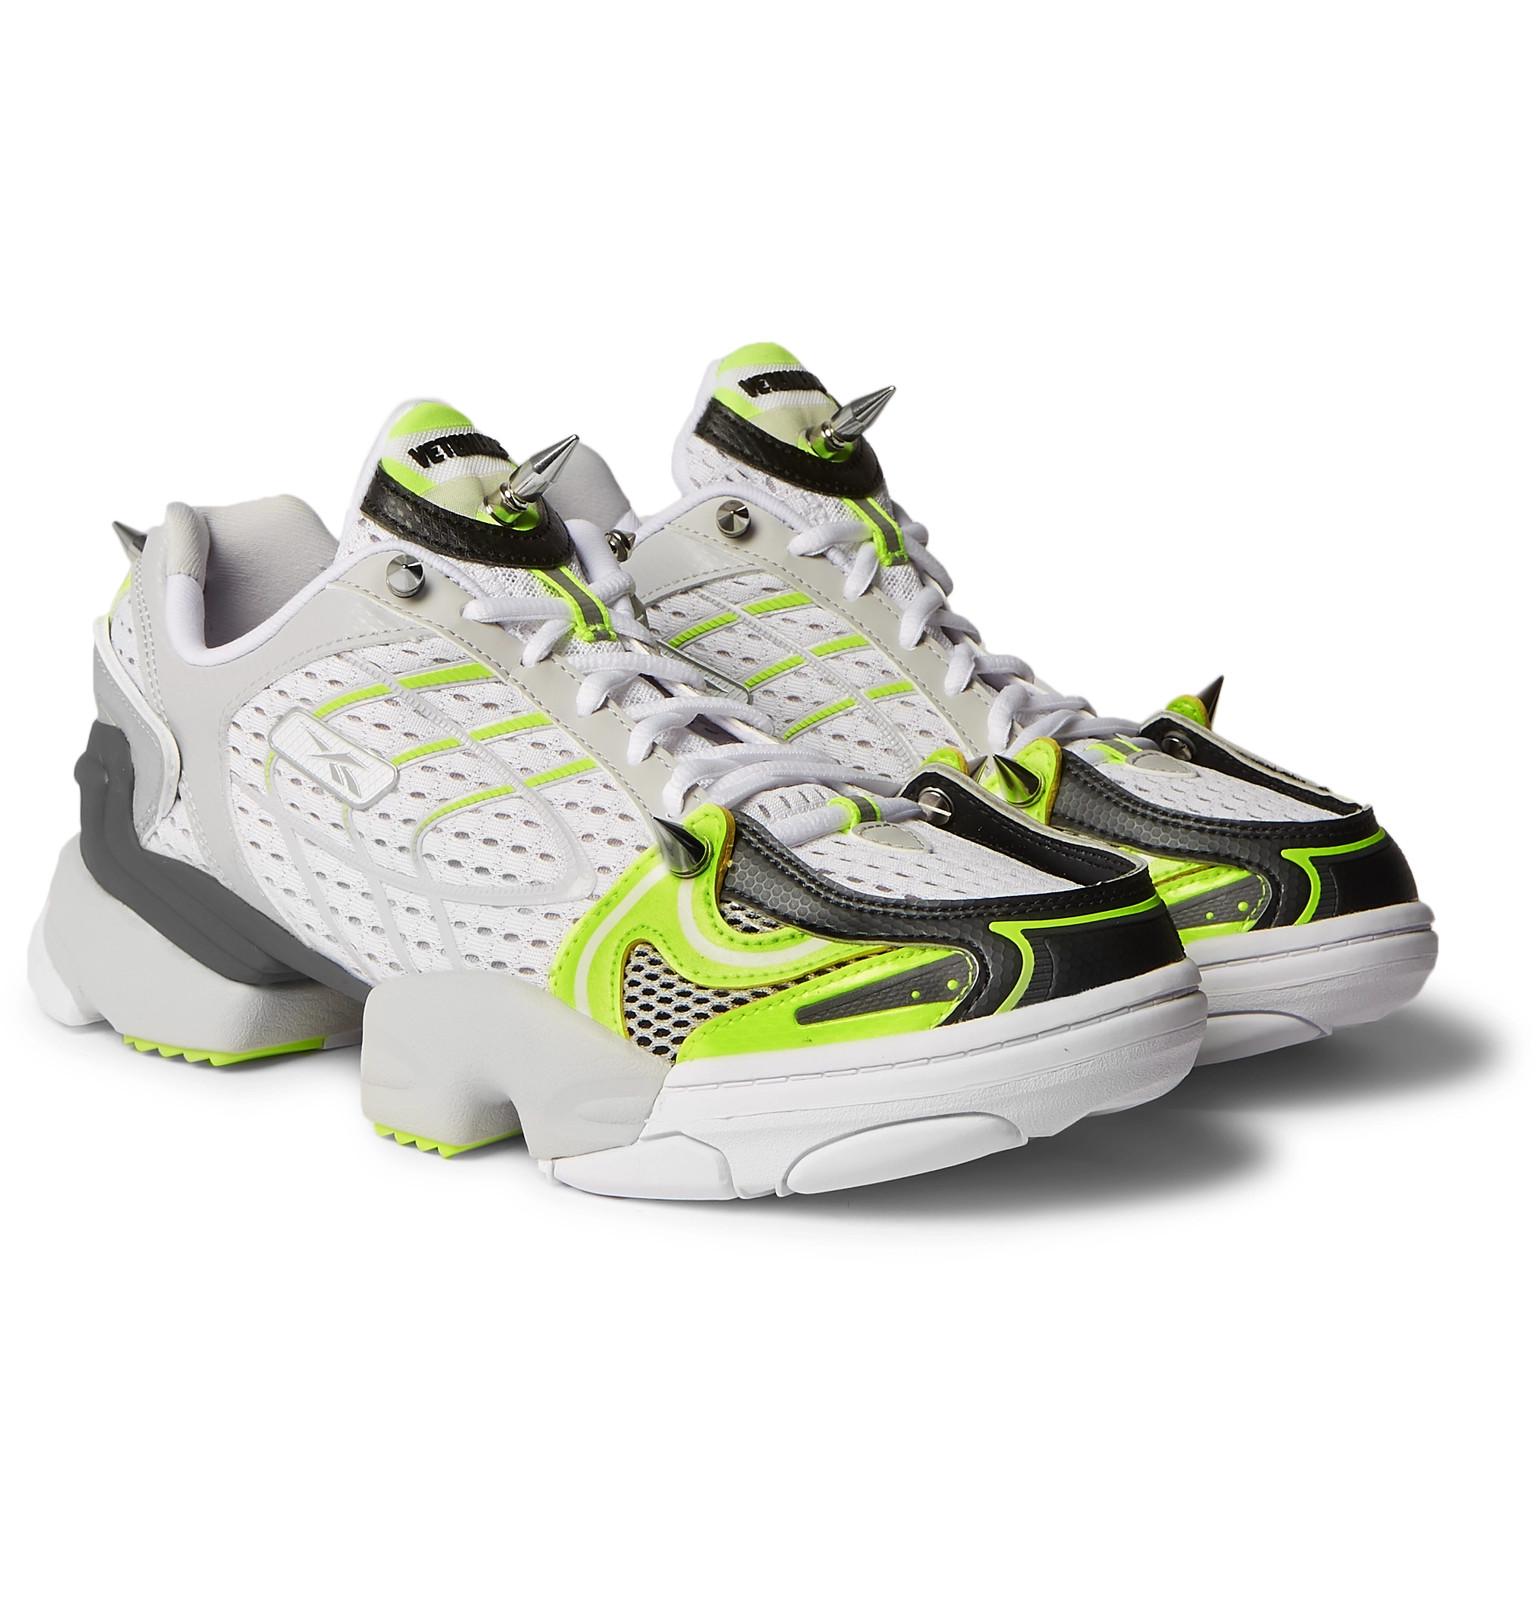 675b81d0581d Vetements+ Reebok Spike Runner 400 Rubber-Trimmed Mesh Sneakers